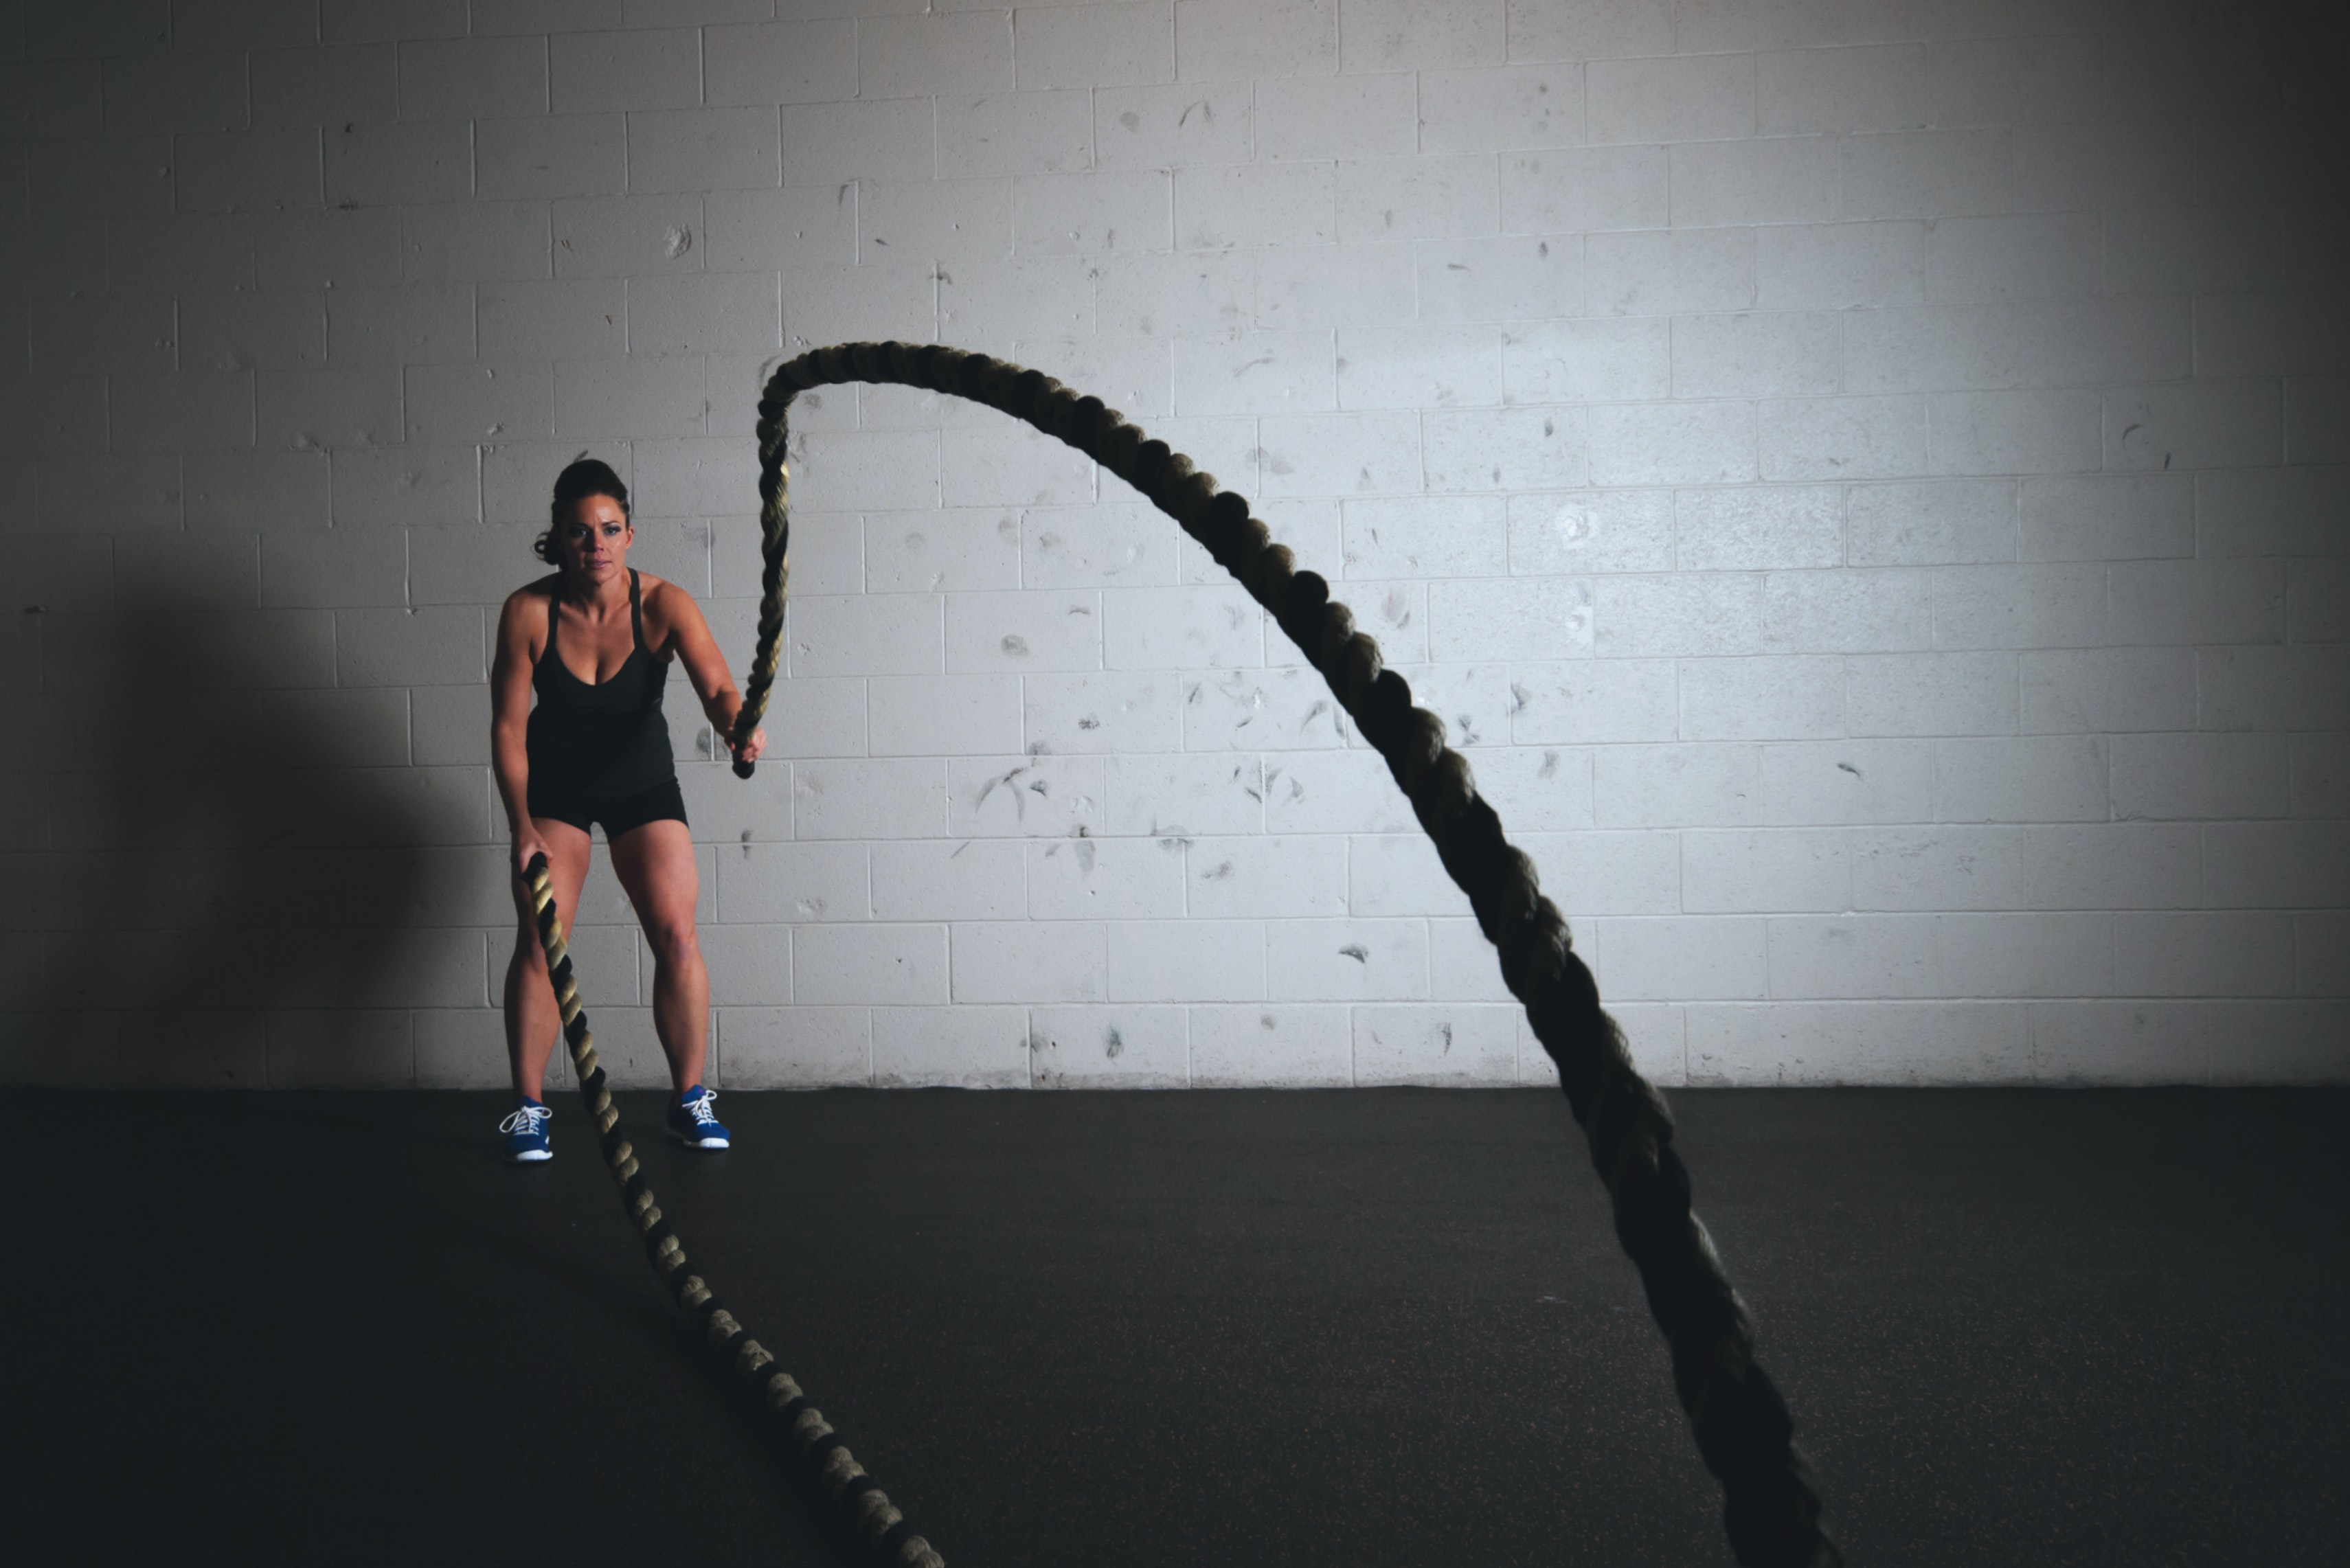 Fitness (incl. Cycling, Running, Yoga, Sports Tech)